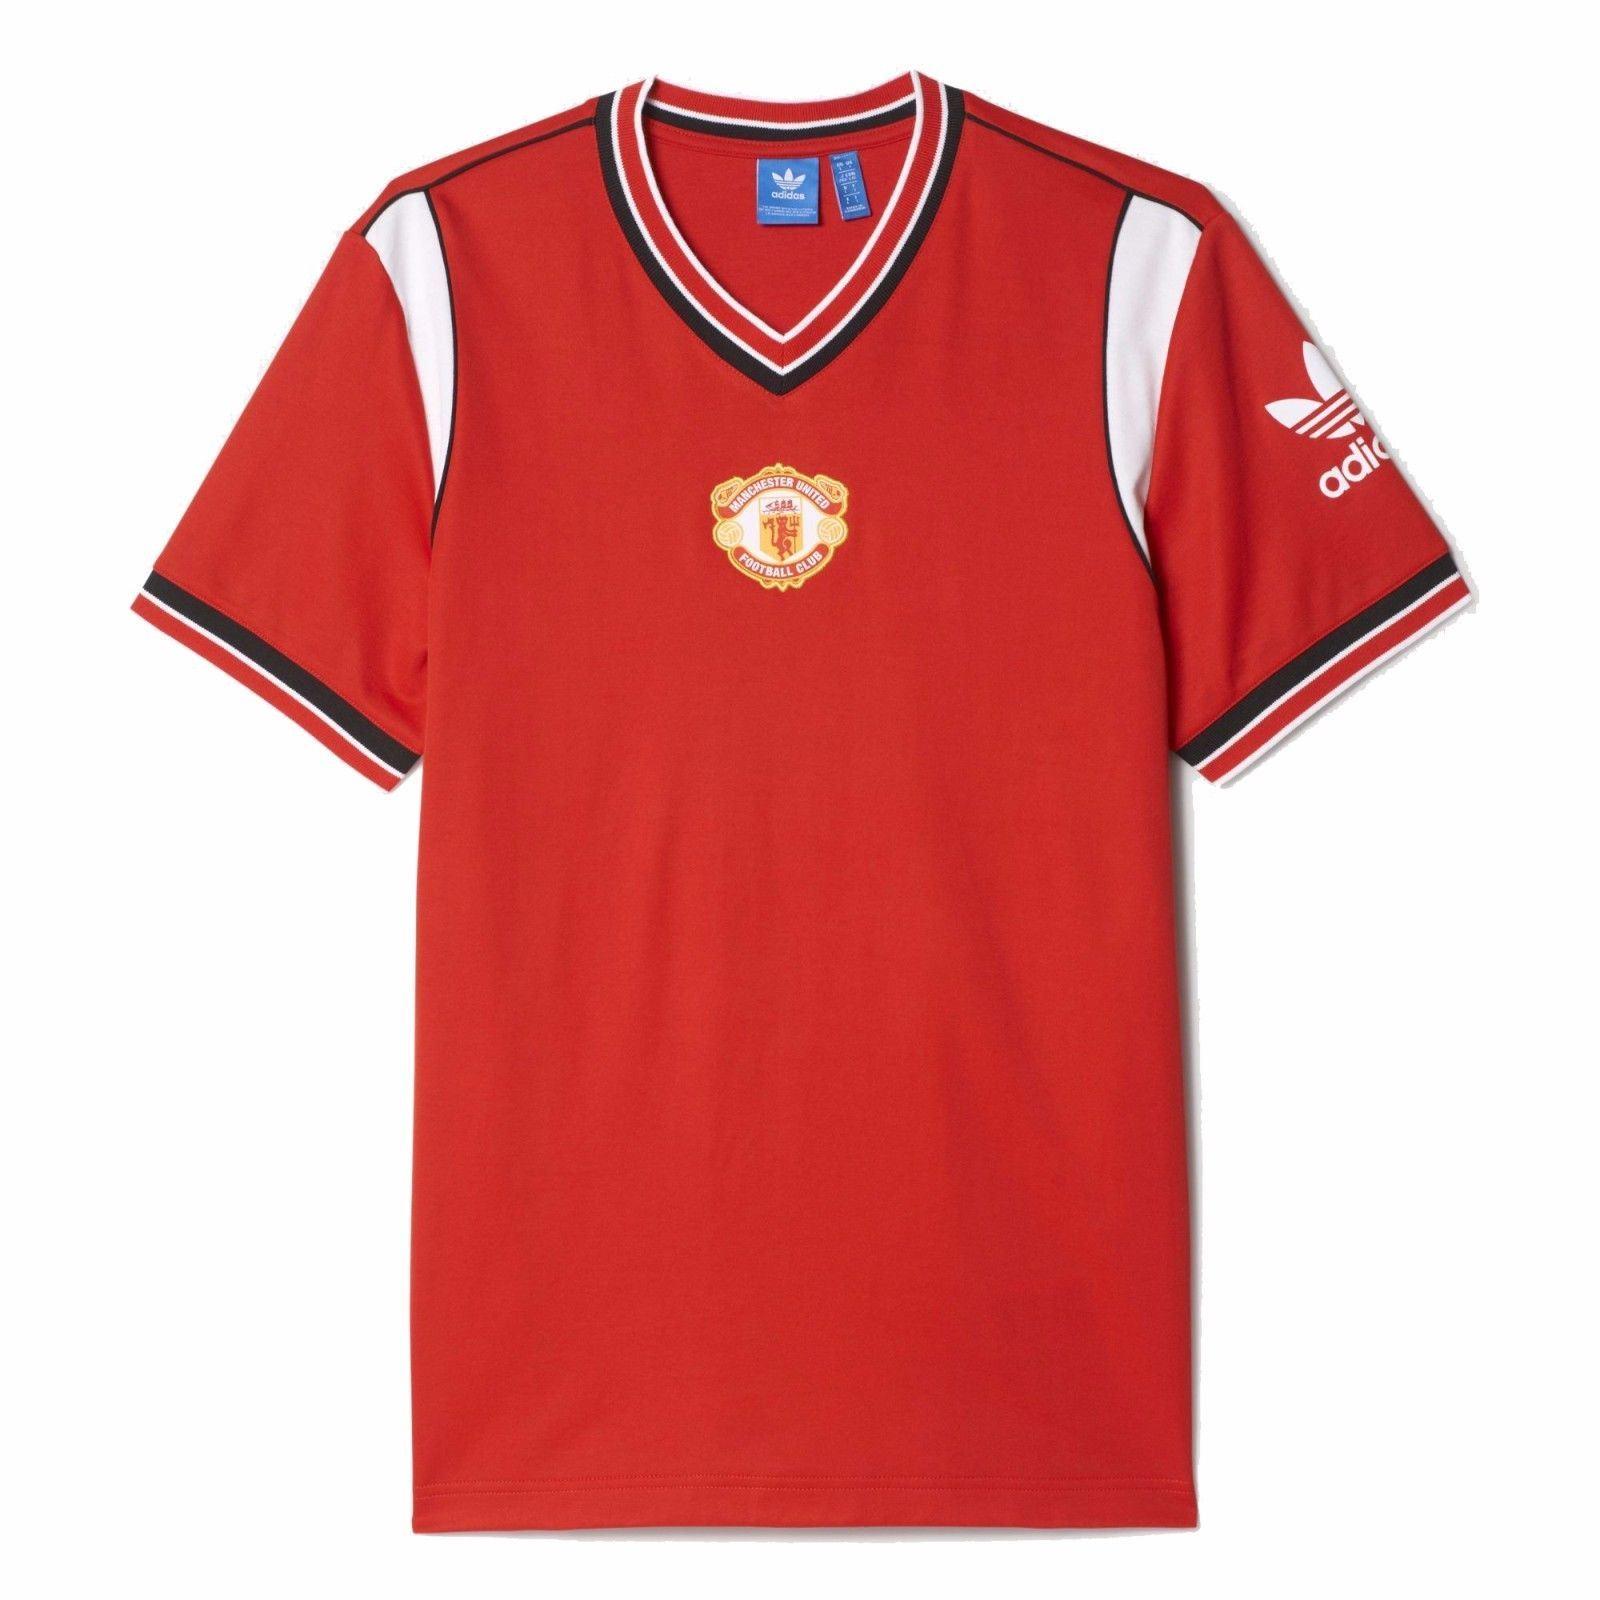 22b681fb8d8 ... adidas Manchester United 1985 Retro Jersey Mens Red Football Soccer Top  T-Shirt ...